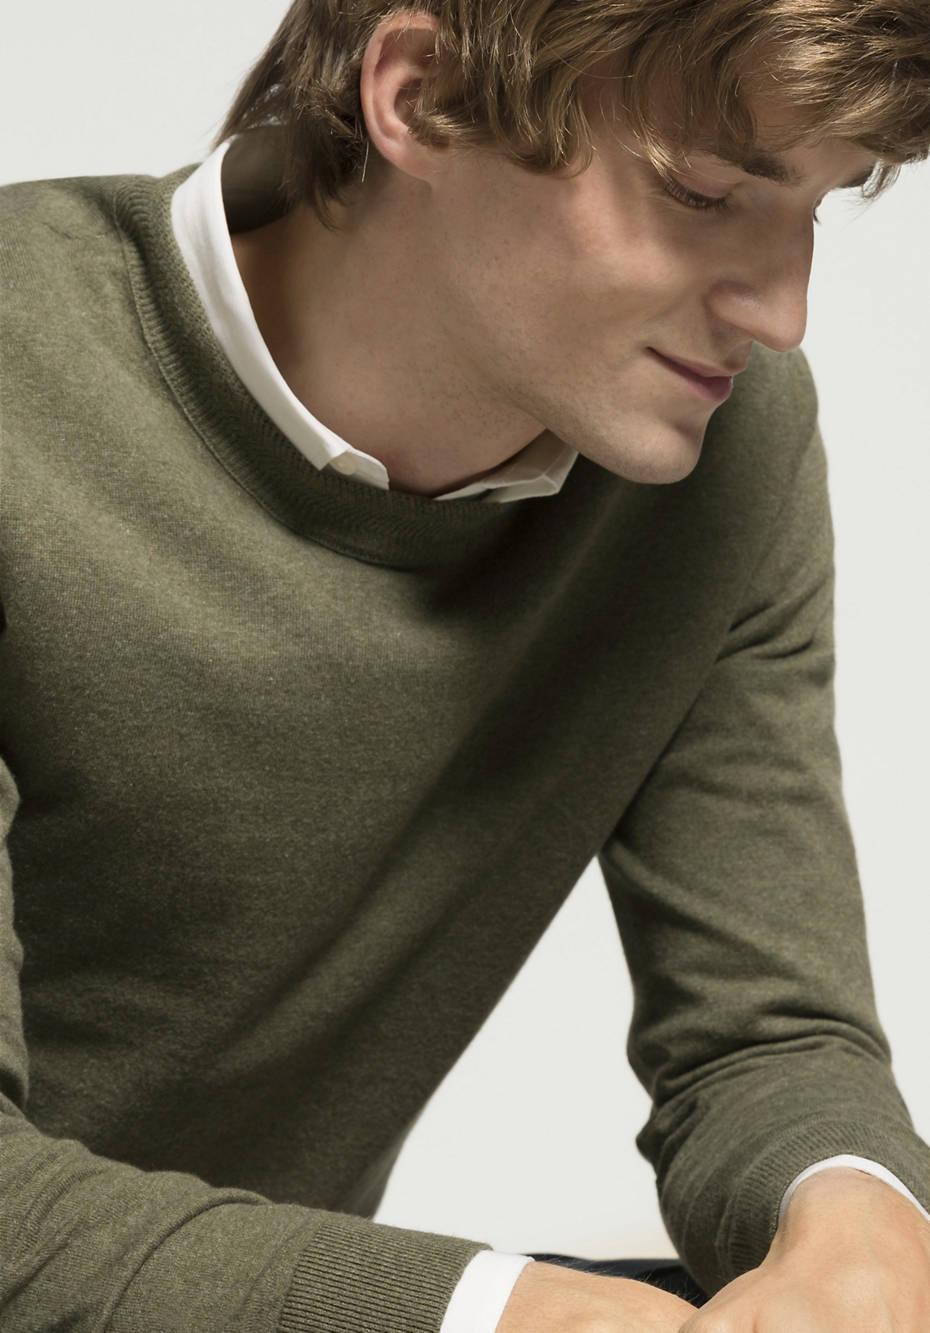 Betterecycling sweater made of organic cotton and Eri silk